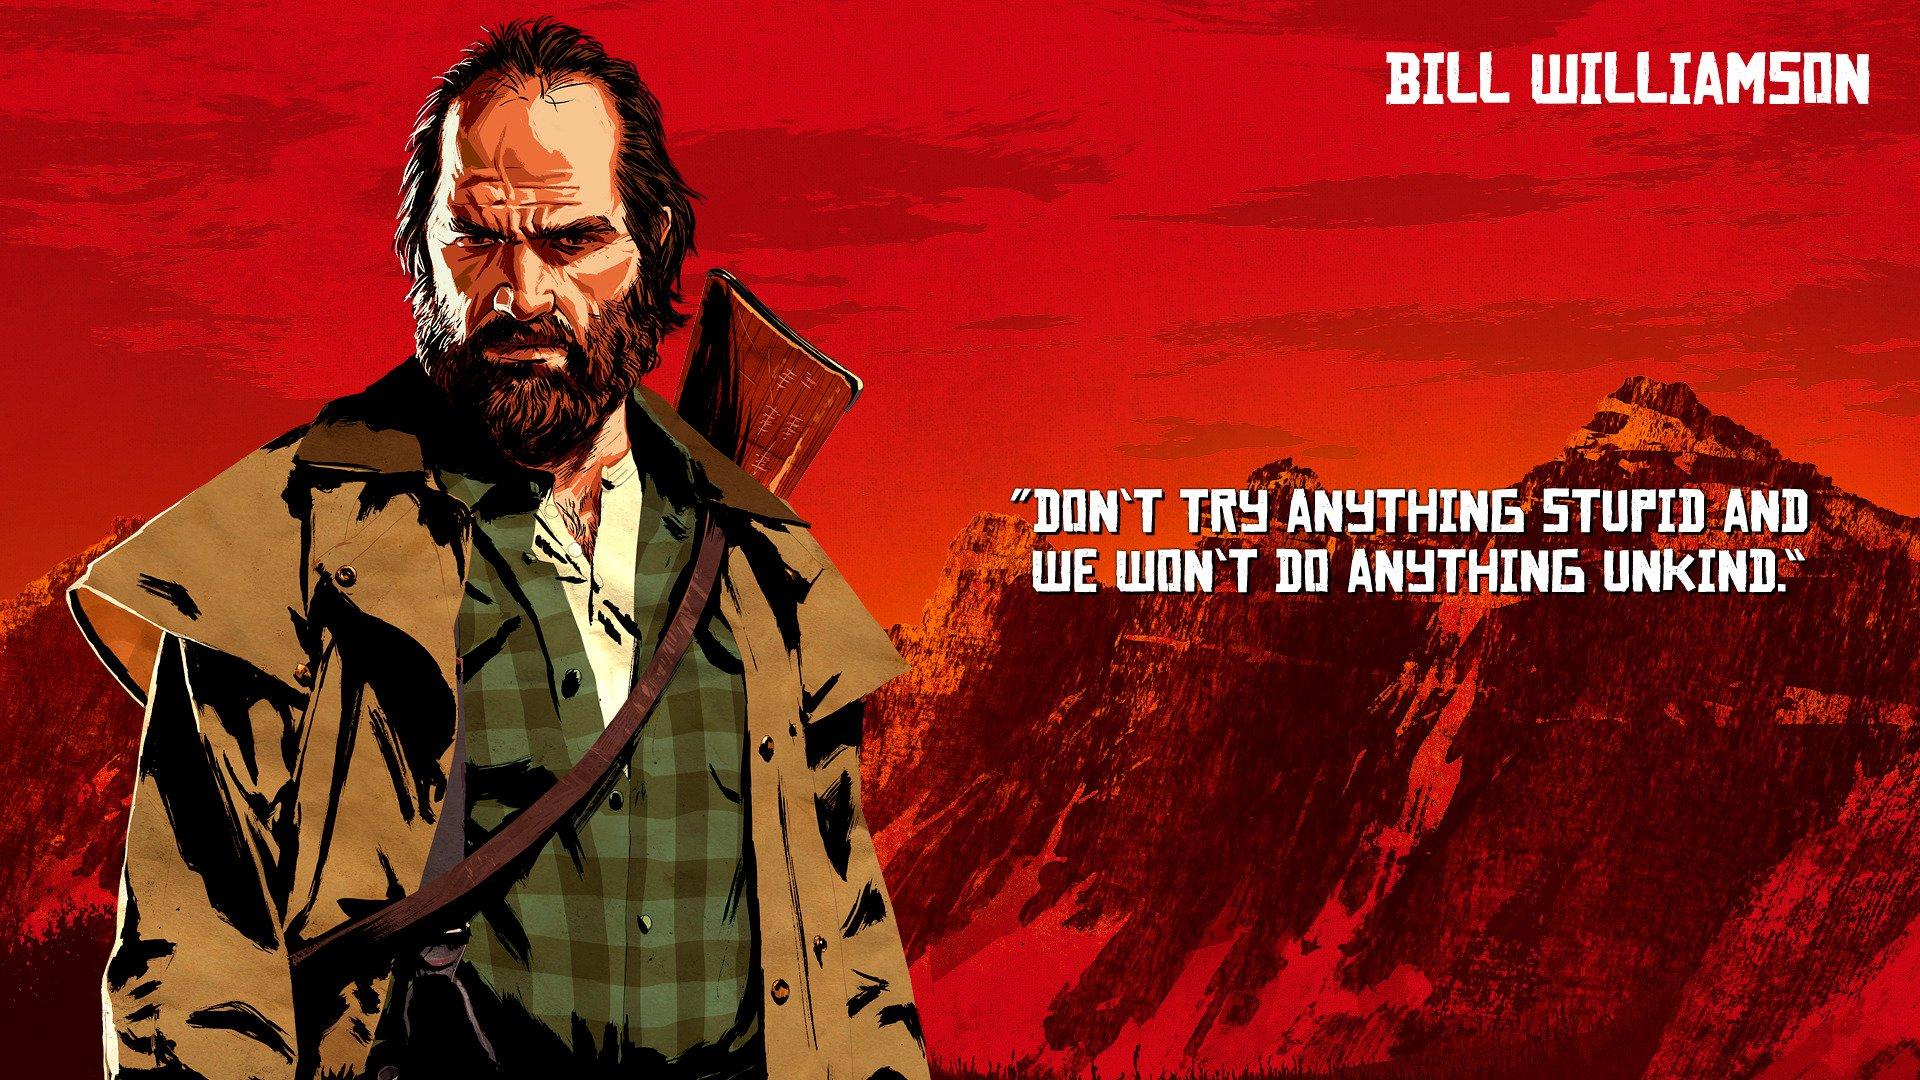 Rockstar Games revela artes dos personagens de Red Dead Redemption 2; veja 4